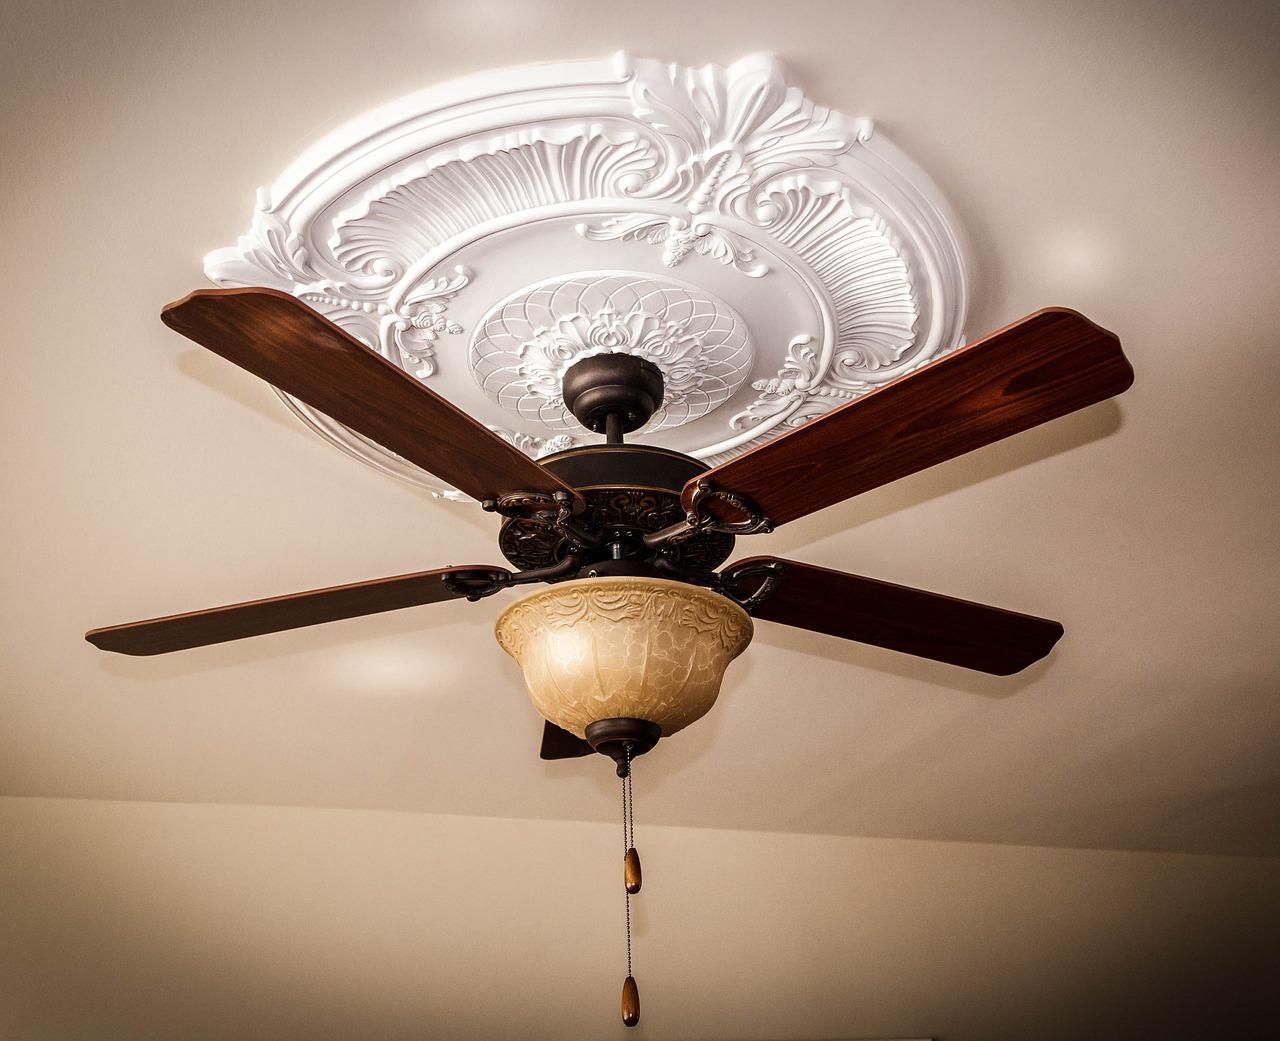 Ceiling Fan Medallion Light Blades Pull Cords Strings